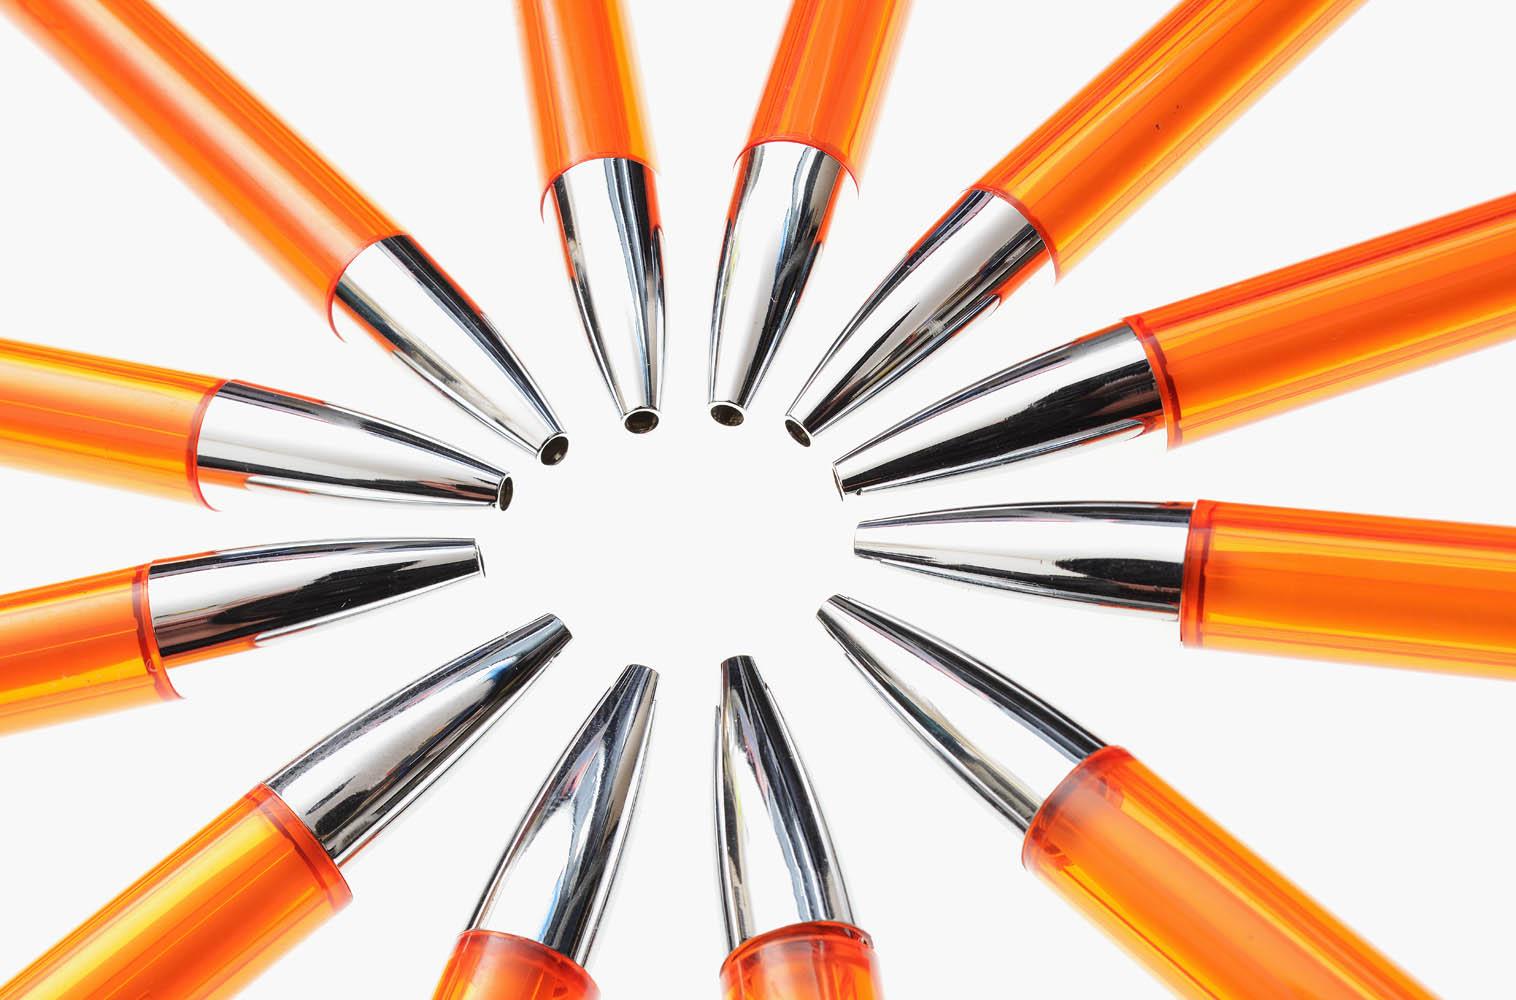 pen-stylo-kugelschreiber